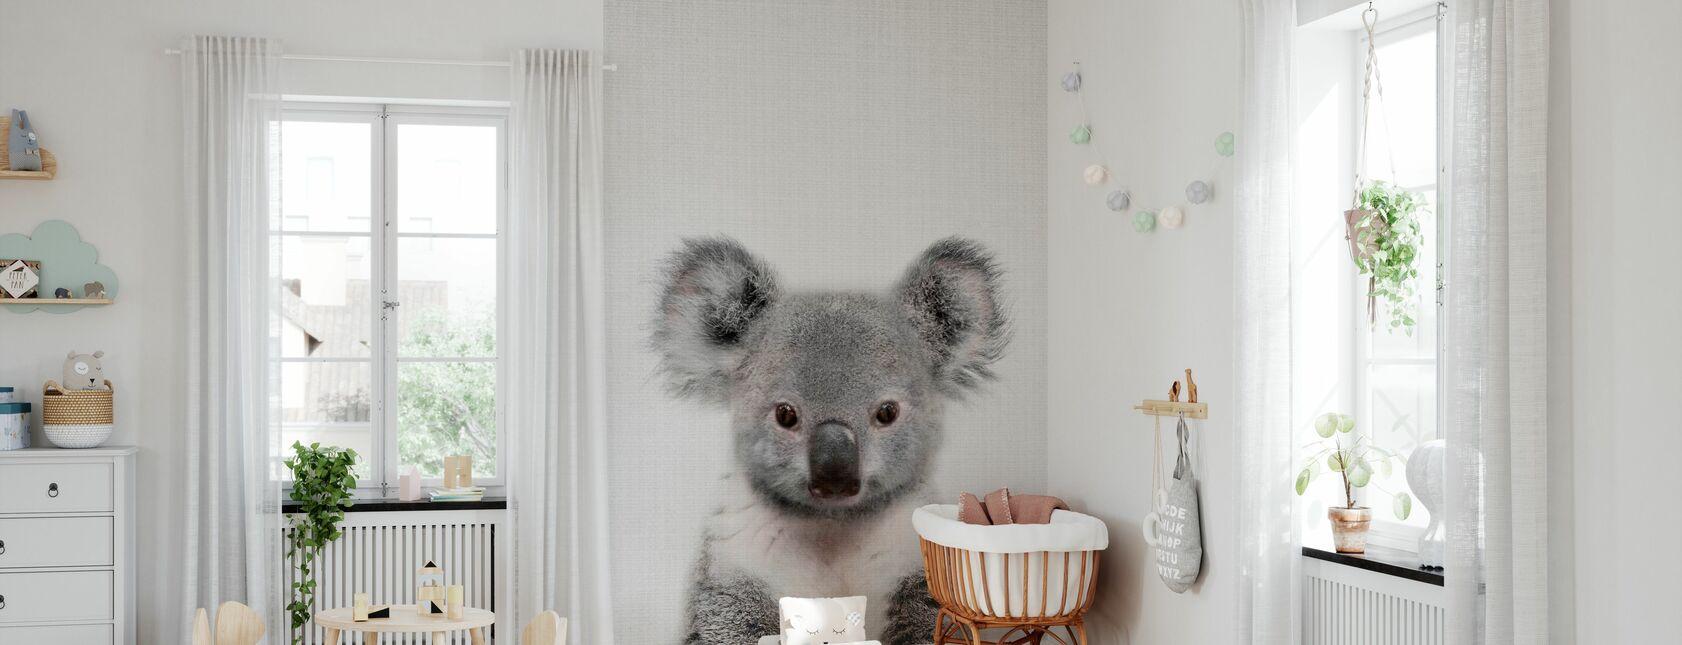 Baby Koala - Tapet - Babyrum